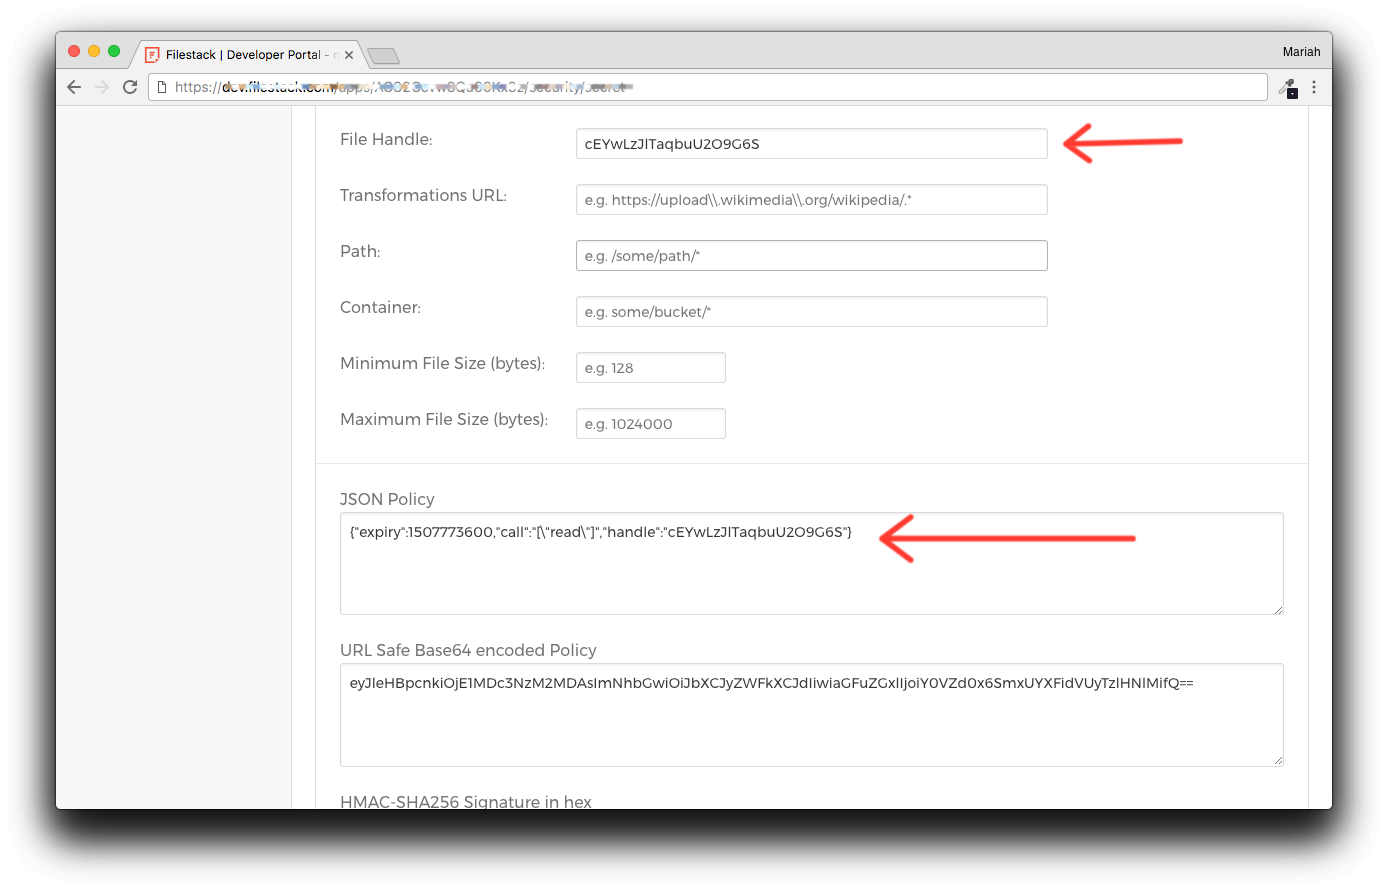 Screenshot showing Filestack security developer portal